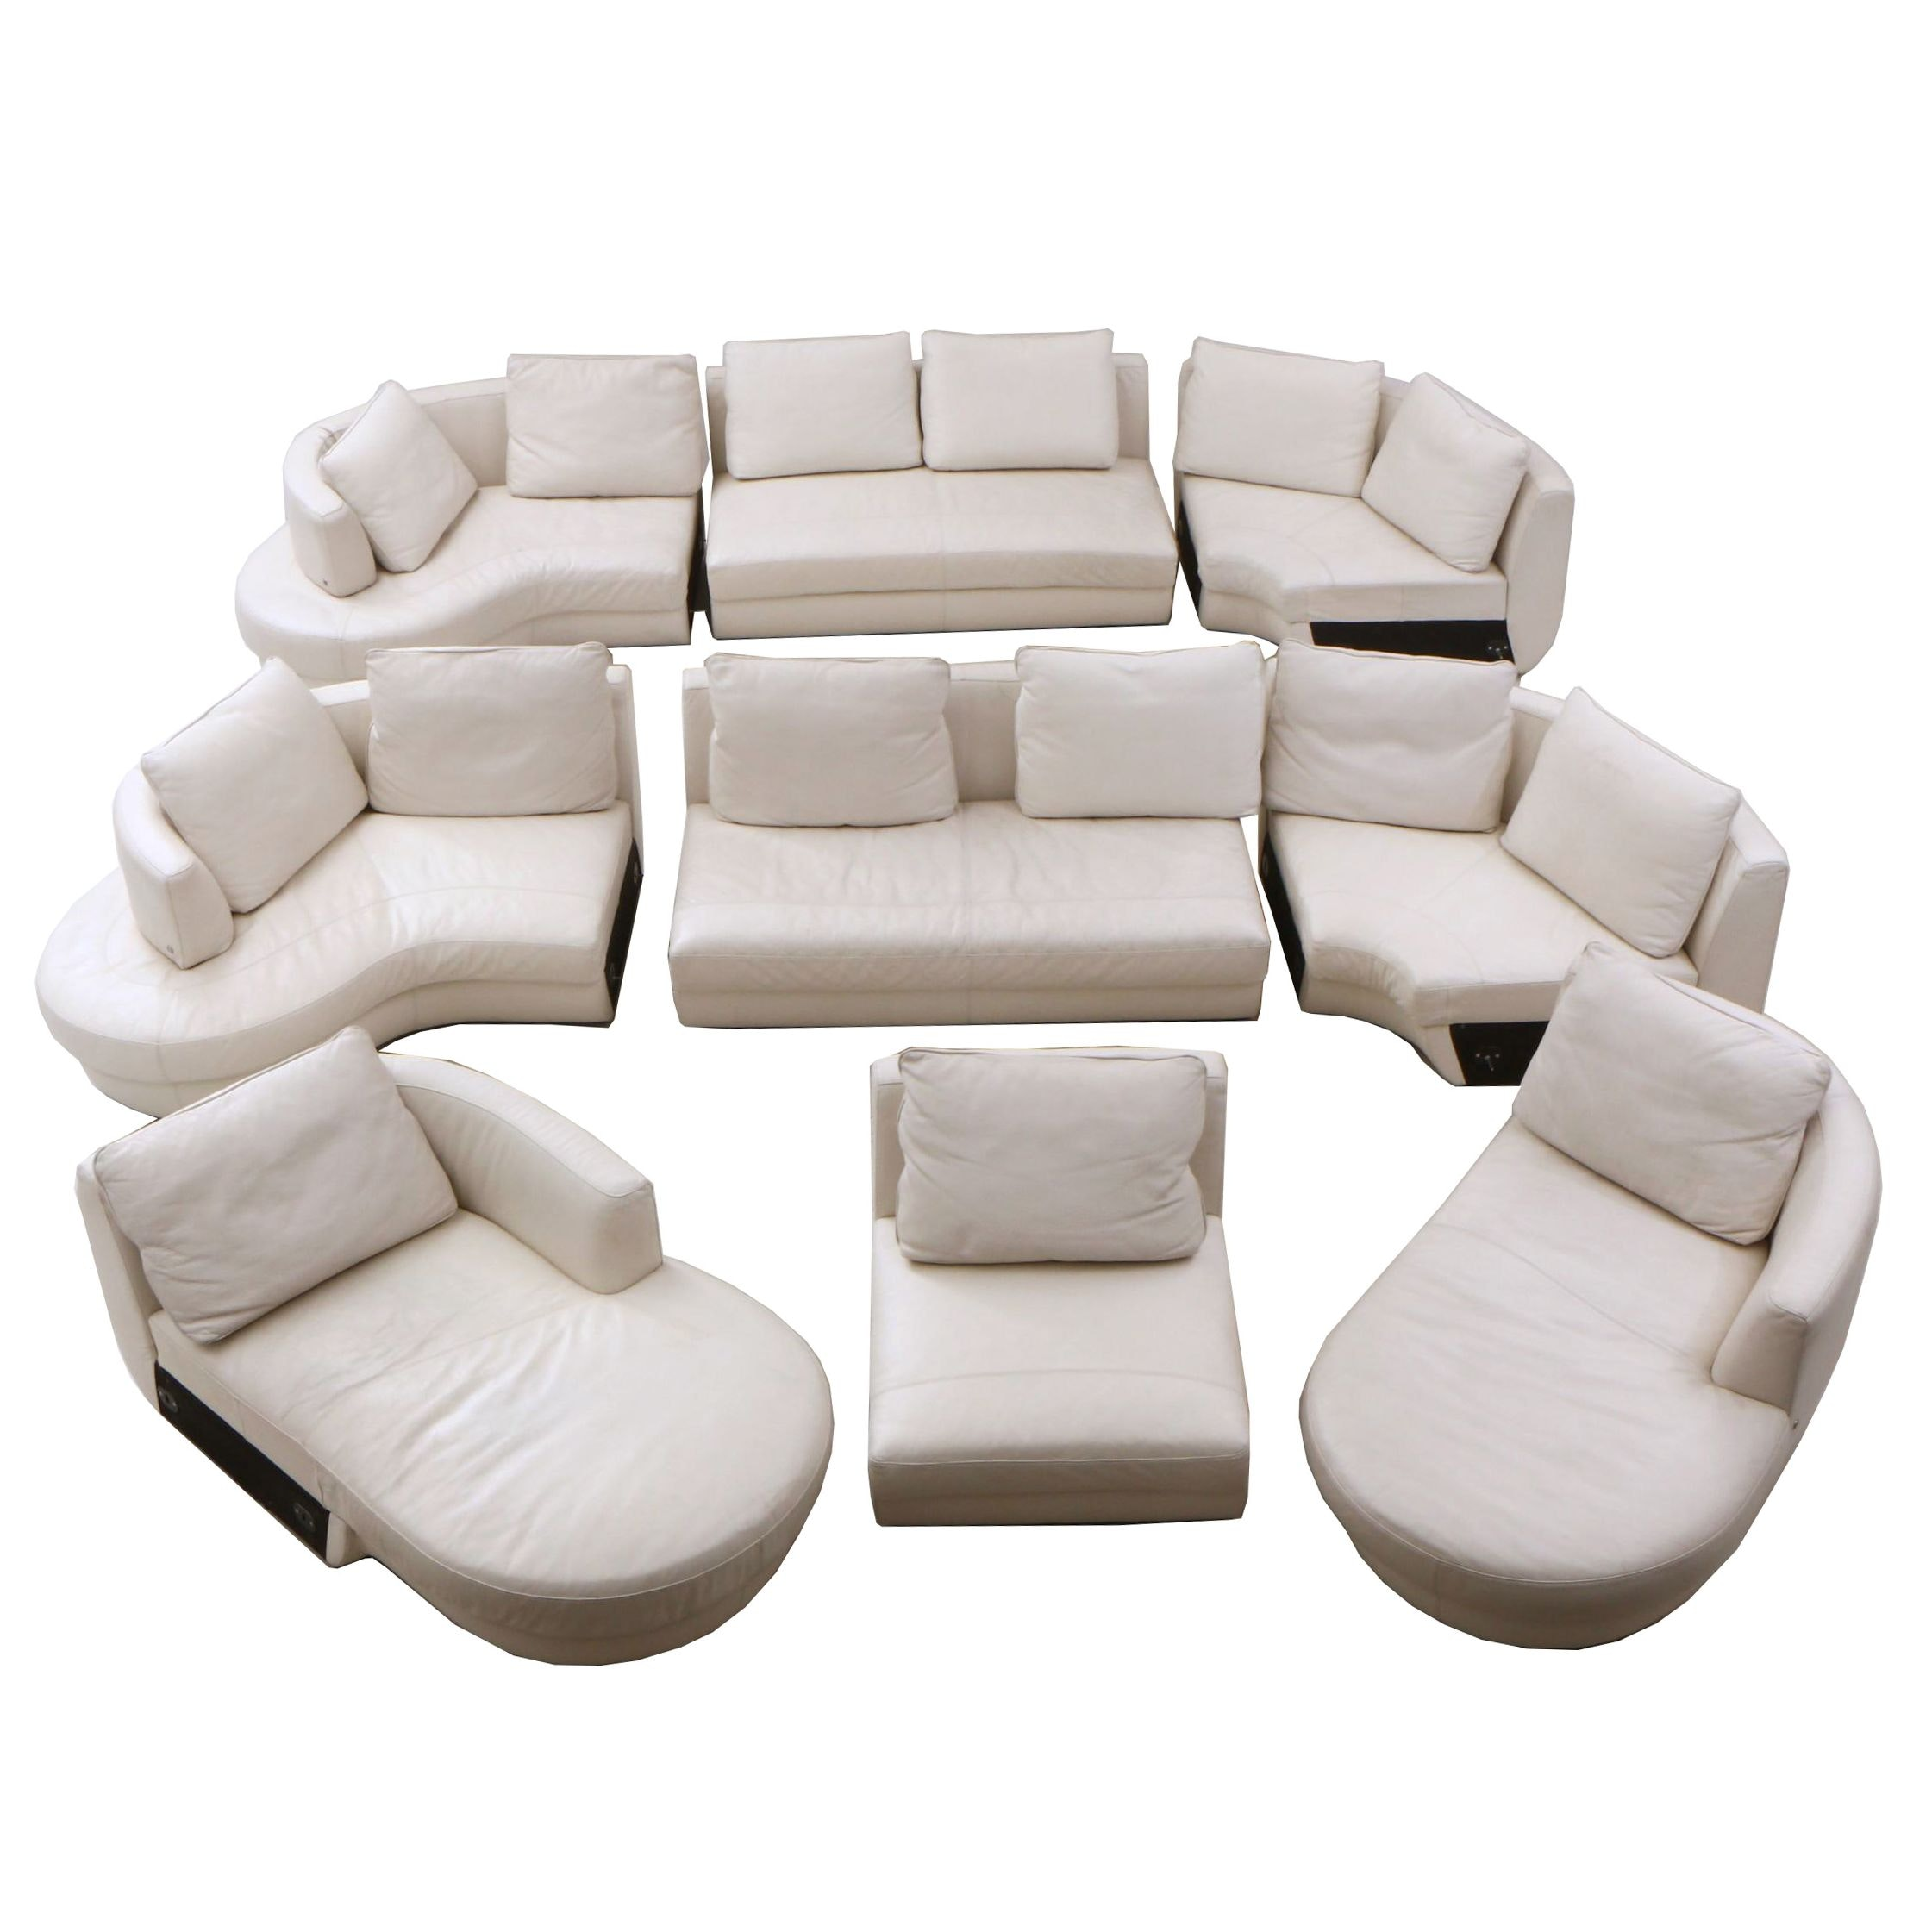 Natuzzi White Leather 9-Piece Sectional Sofa